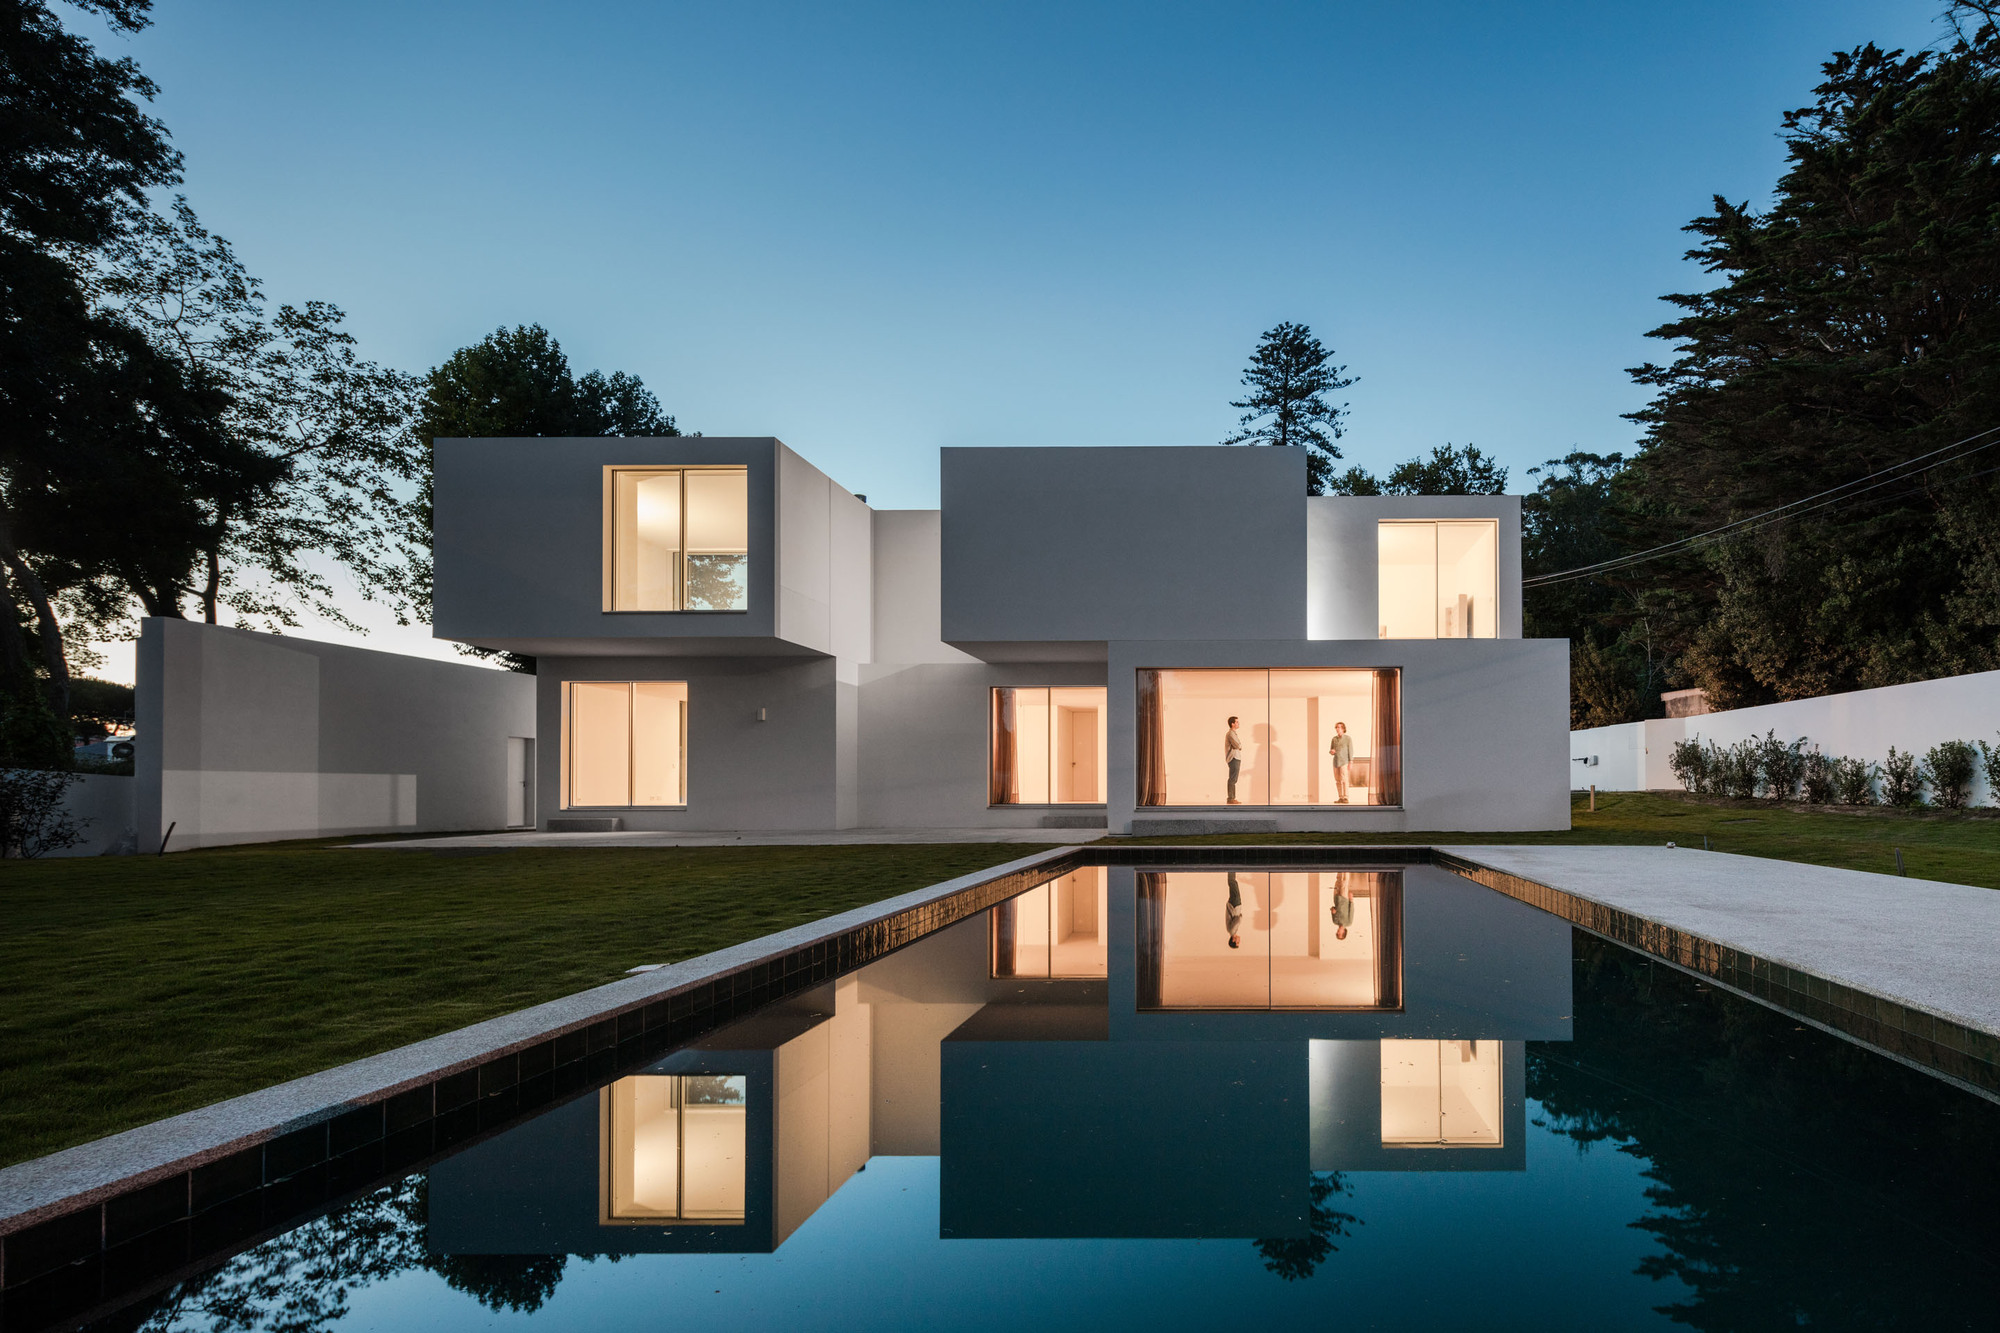 Gallery of house mr 236 arquitectos 2 for Modern rectangular house design